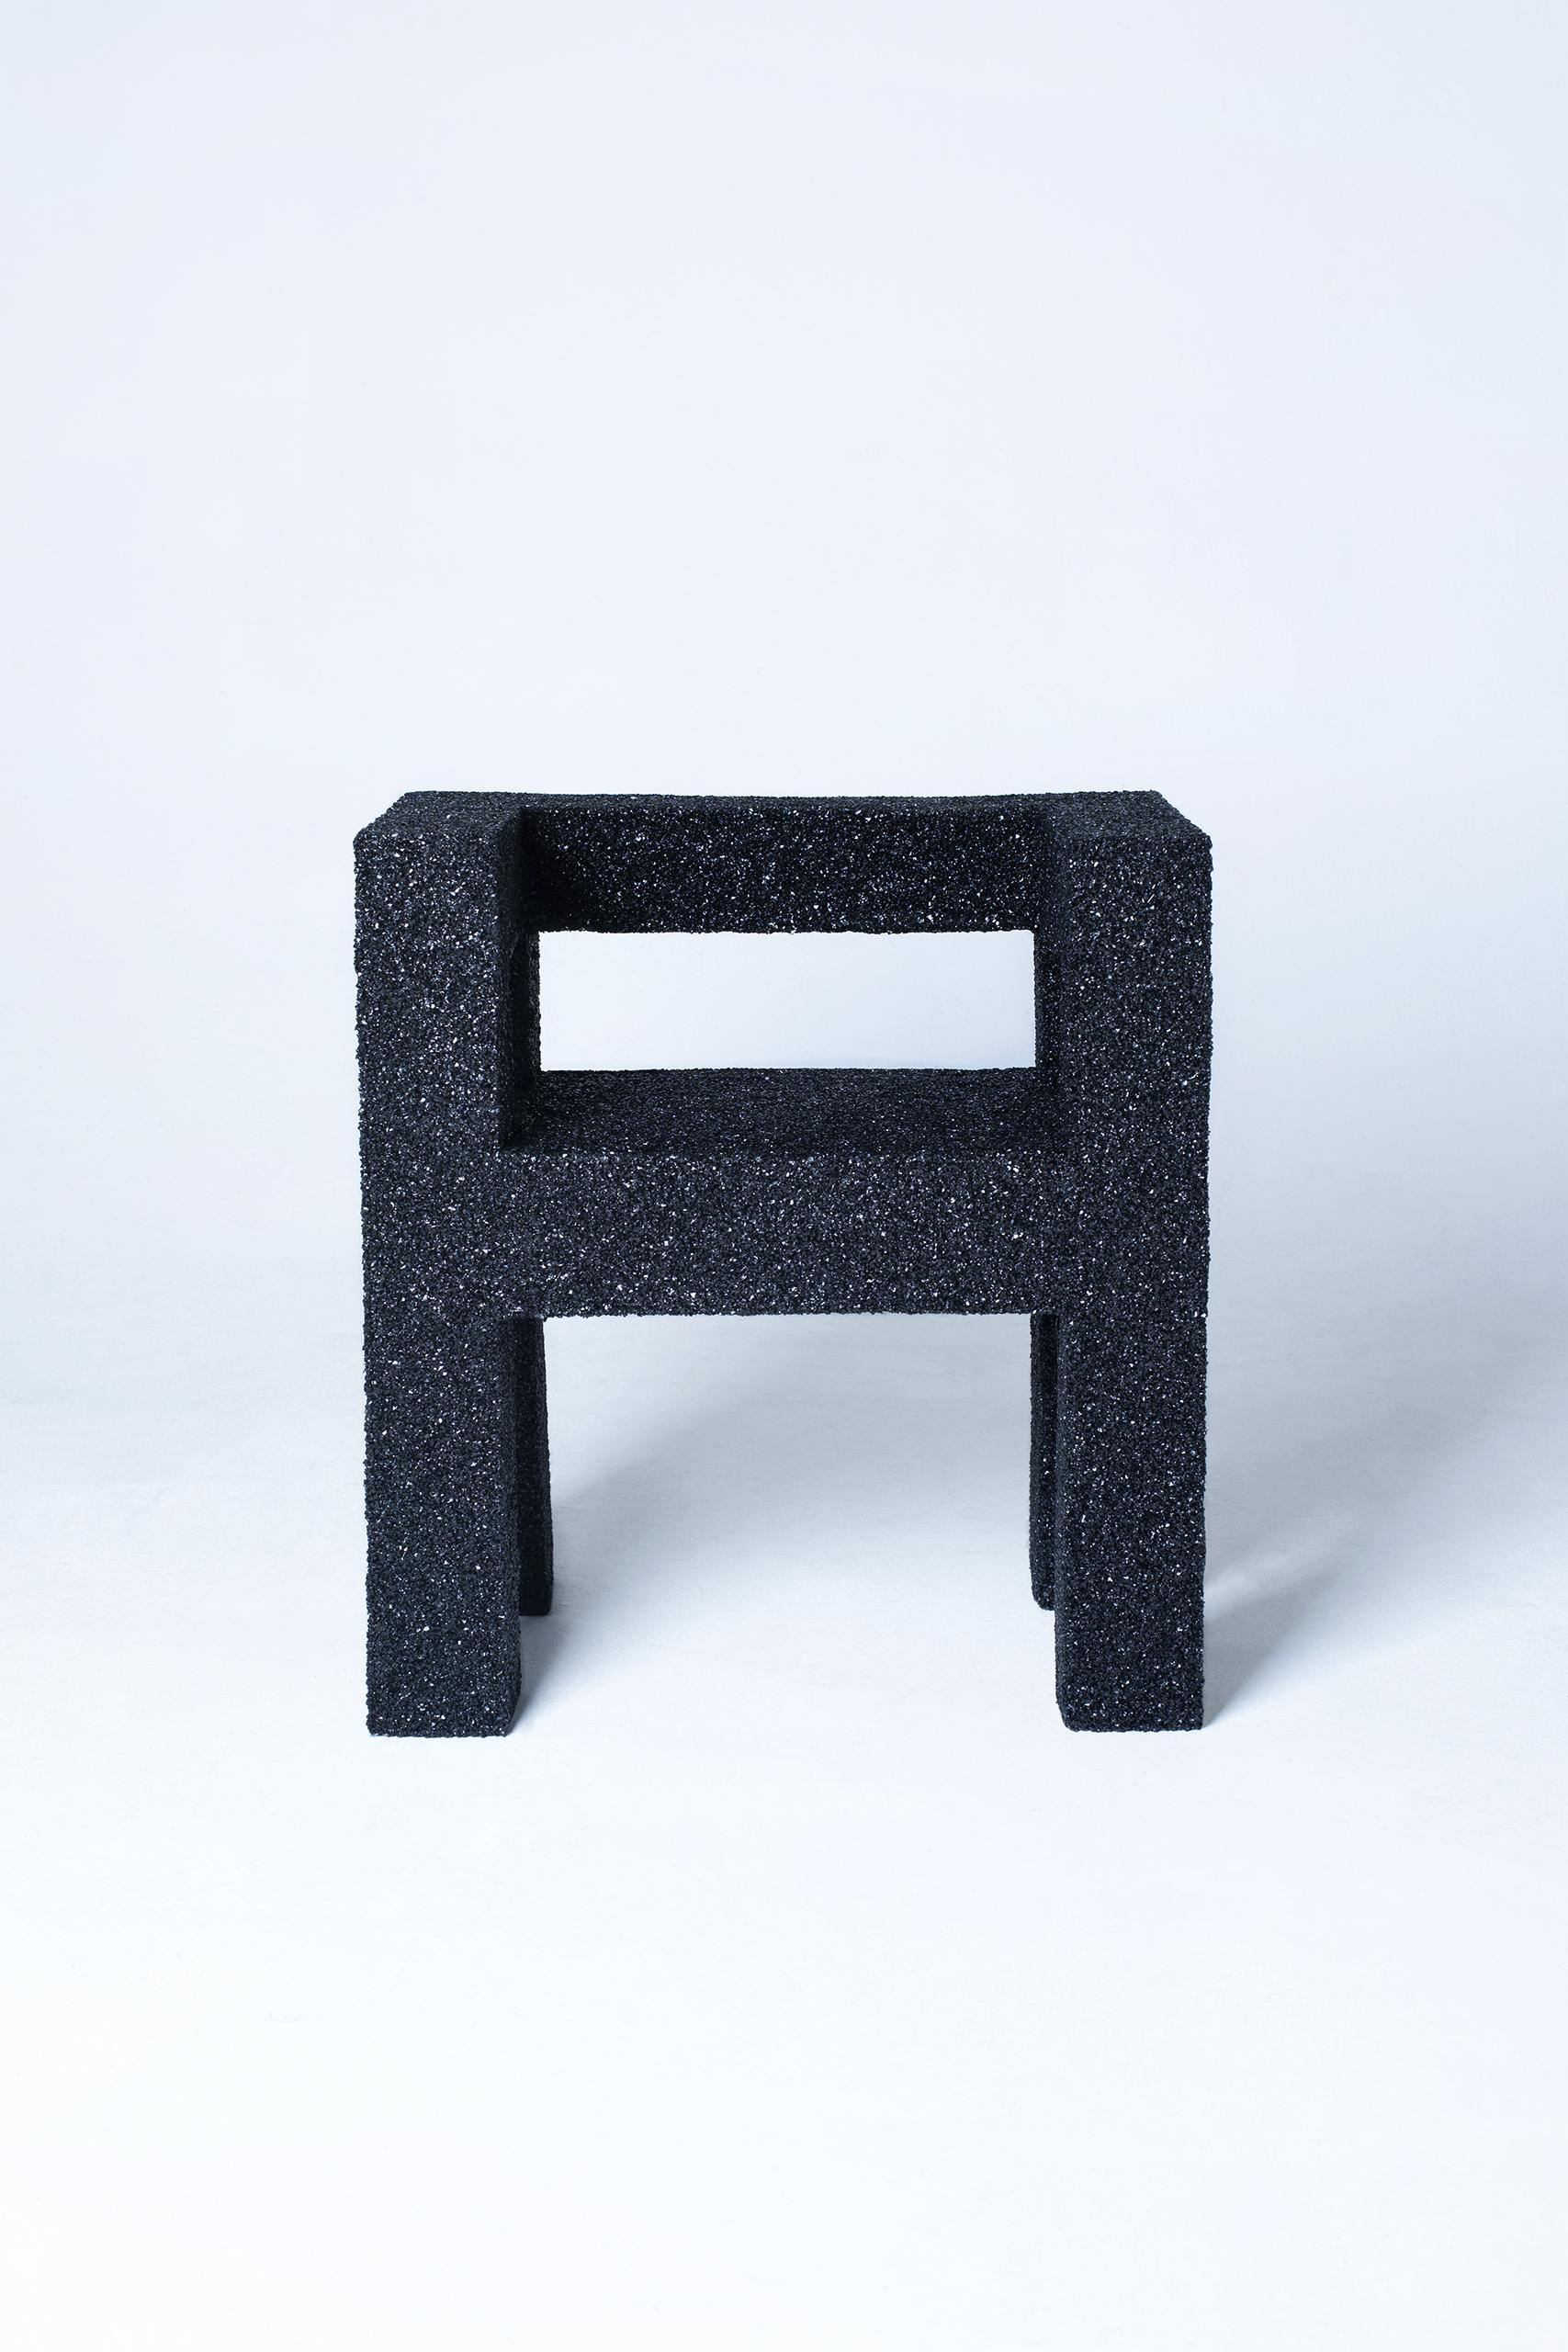 01 Aufgabe Null, Germany. One - armchair, 2020, L 40 x W 65 x H 60 cm, EPDM-wood-foam, unique piece. Image © Theresa Lou